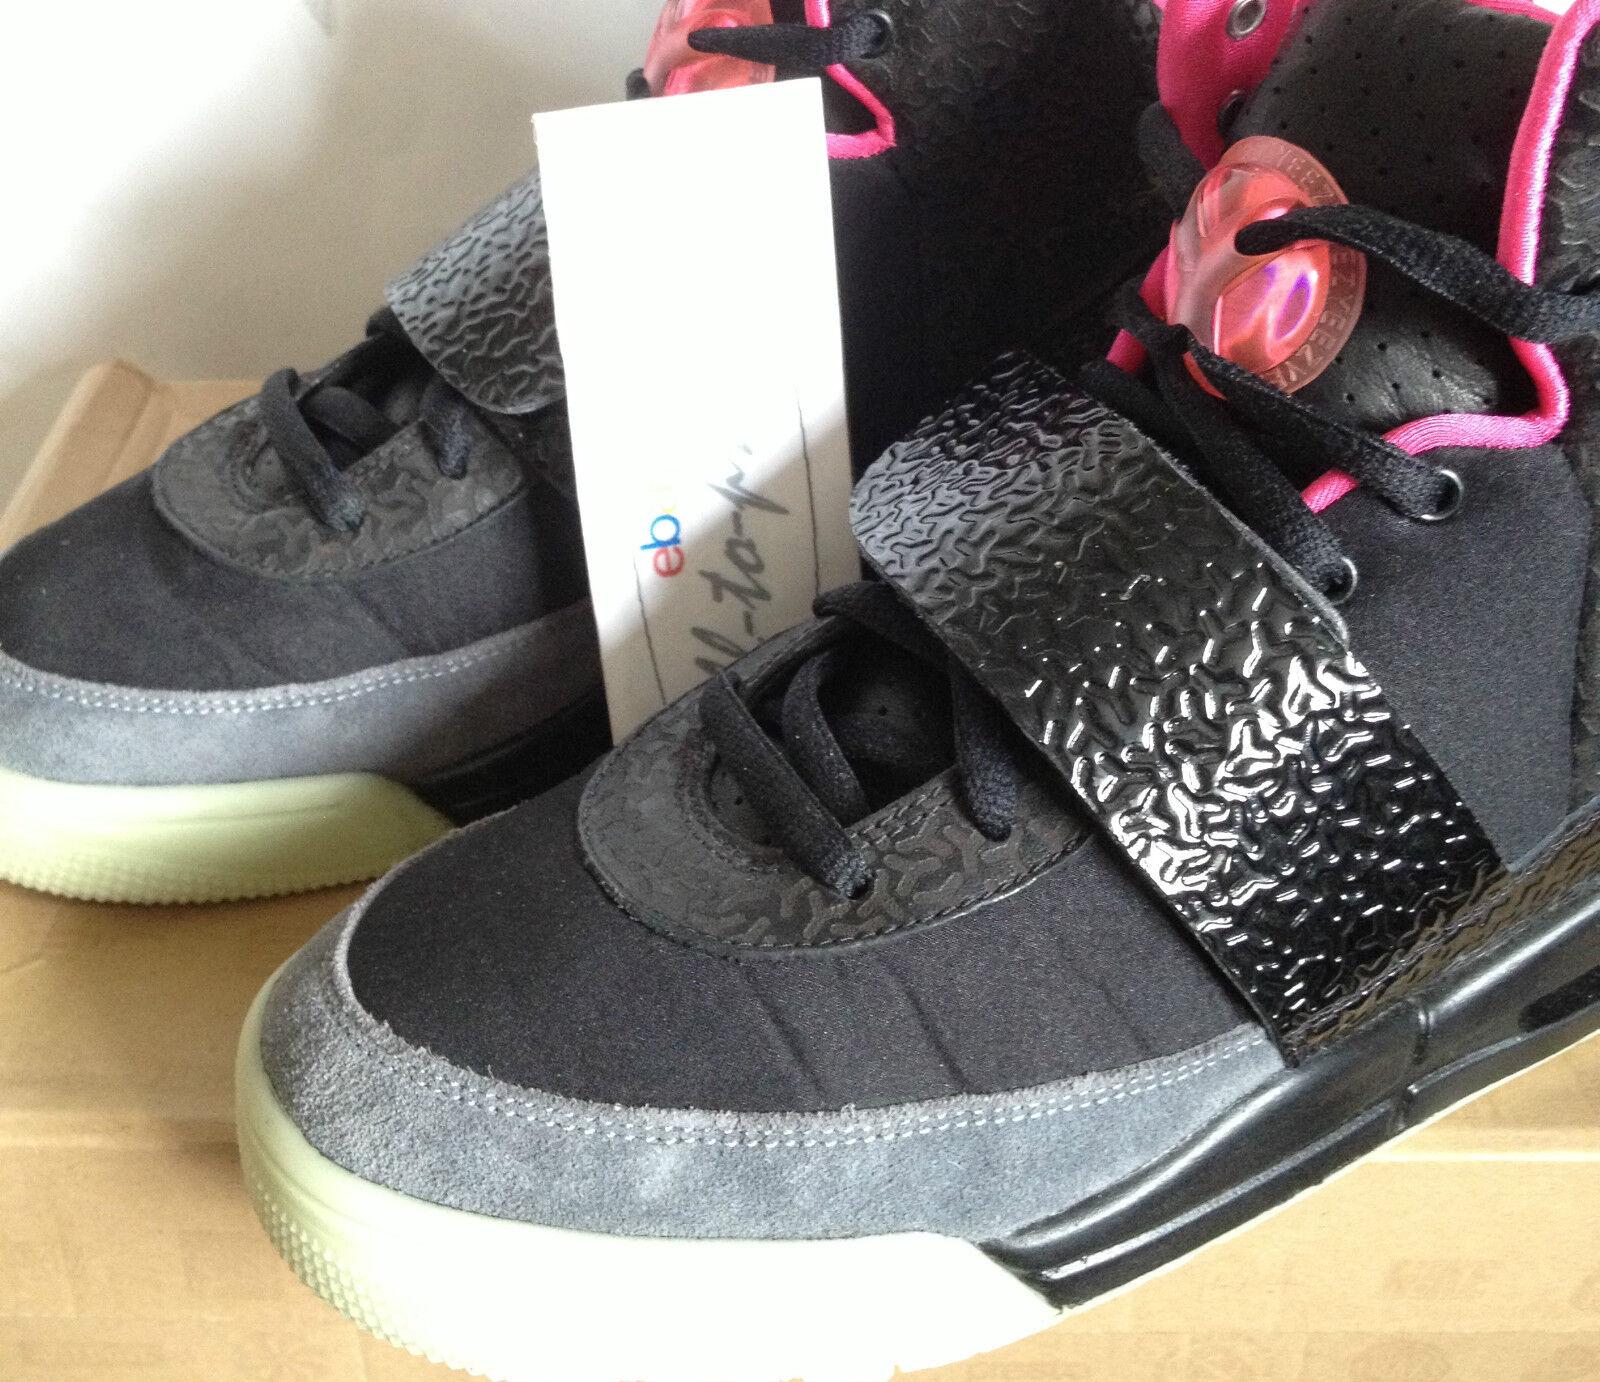 (utilizzato) Nike Air Yeezy 1 uno BLINK US8.5 UK7.5 UK7.5 UK7.5 NERO 366164-003 luminescenza Kanye West | La prima serie di specifiche complete per i clienti  | Sig/Sig Ra Scarpa  6aa0a9